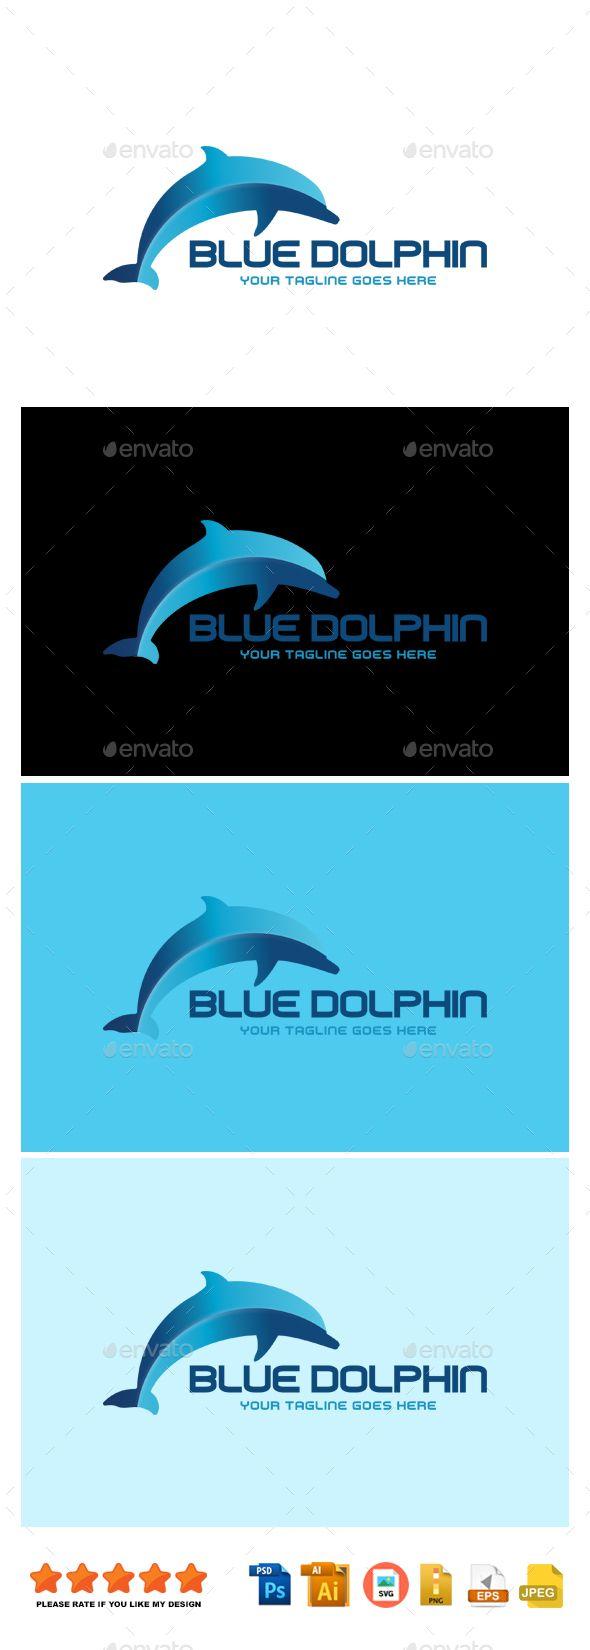 Blue Dolphin | Pinterest | Logo templates, Logos and Template